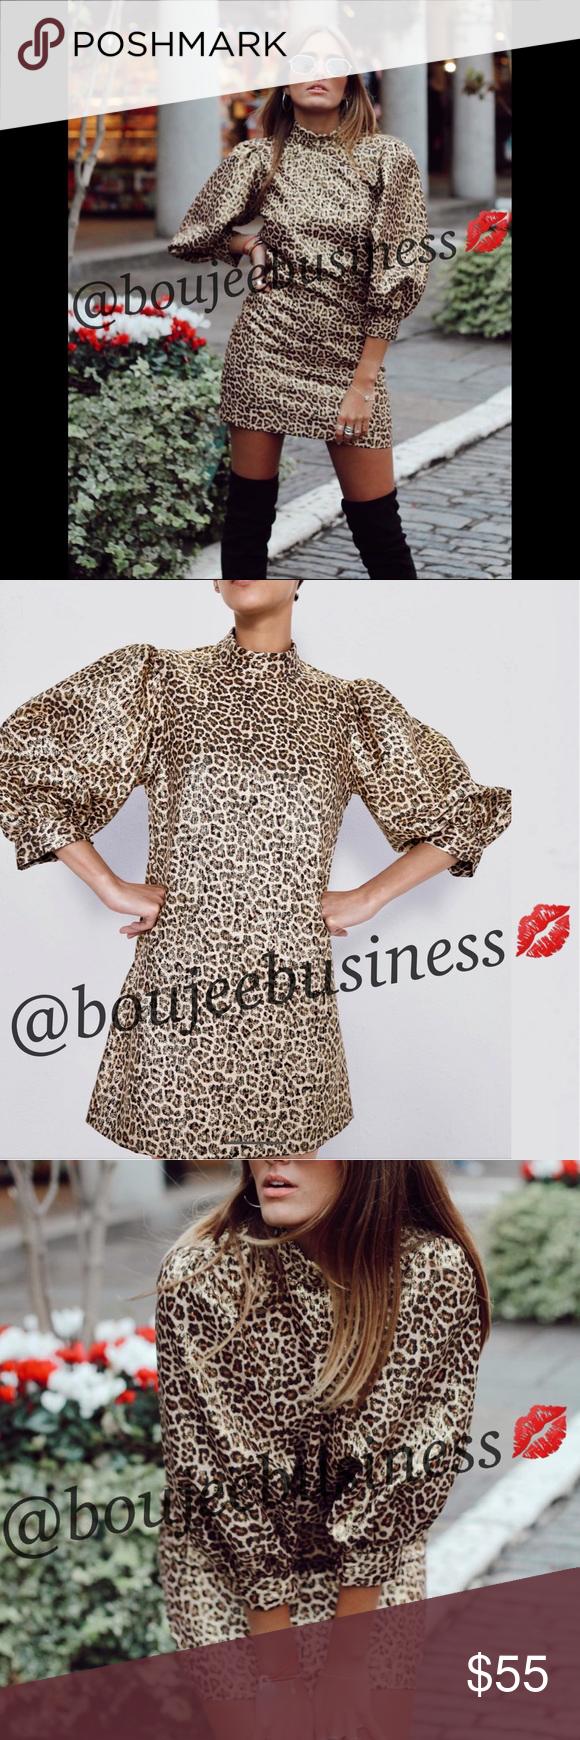 L 1970s 1980s Black and Leopard Print Long Sleeve Winter Dress